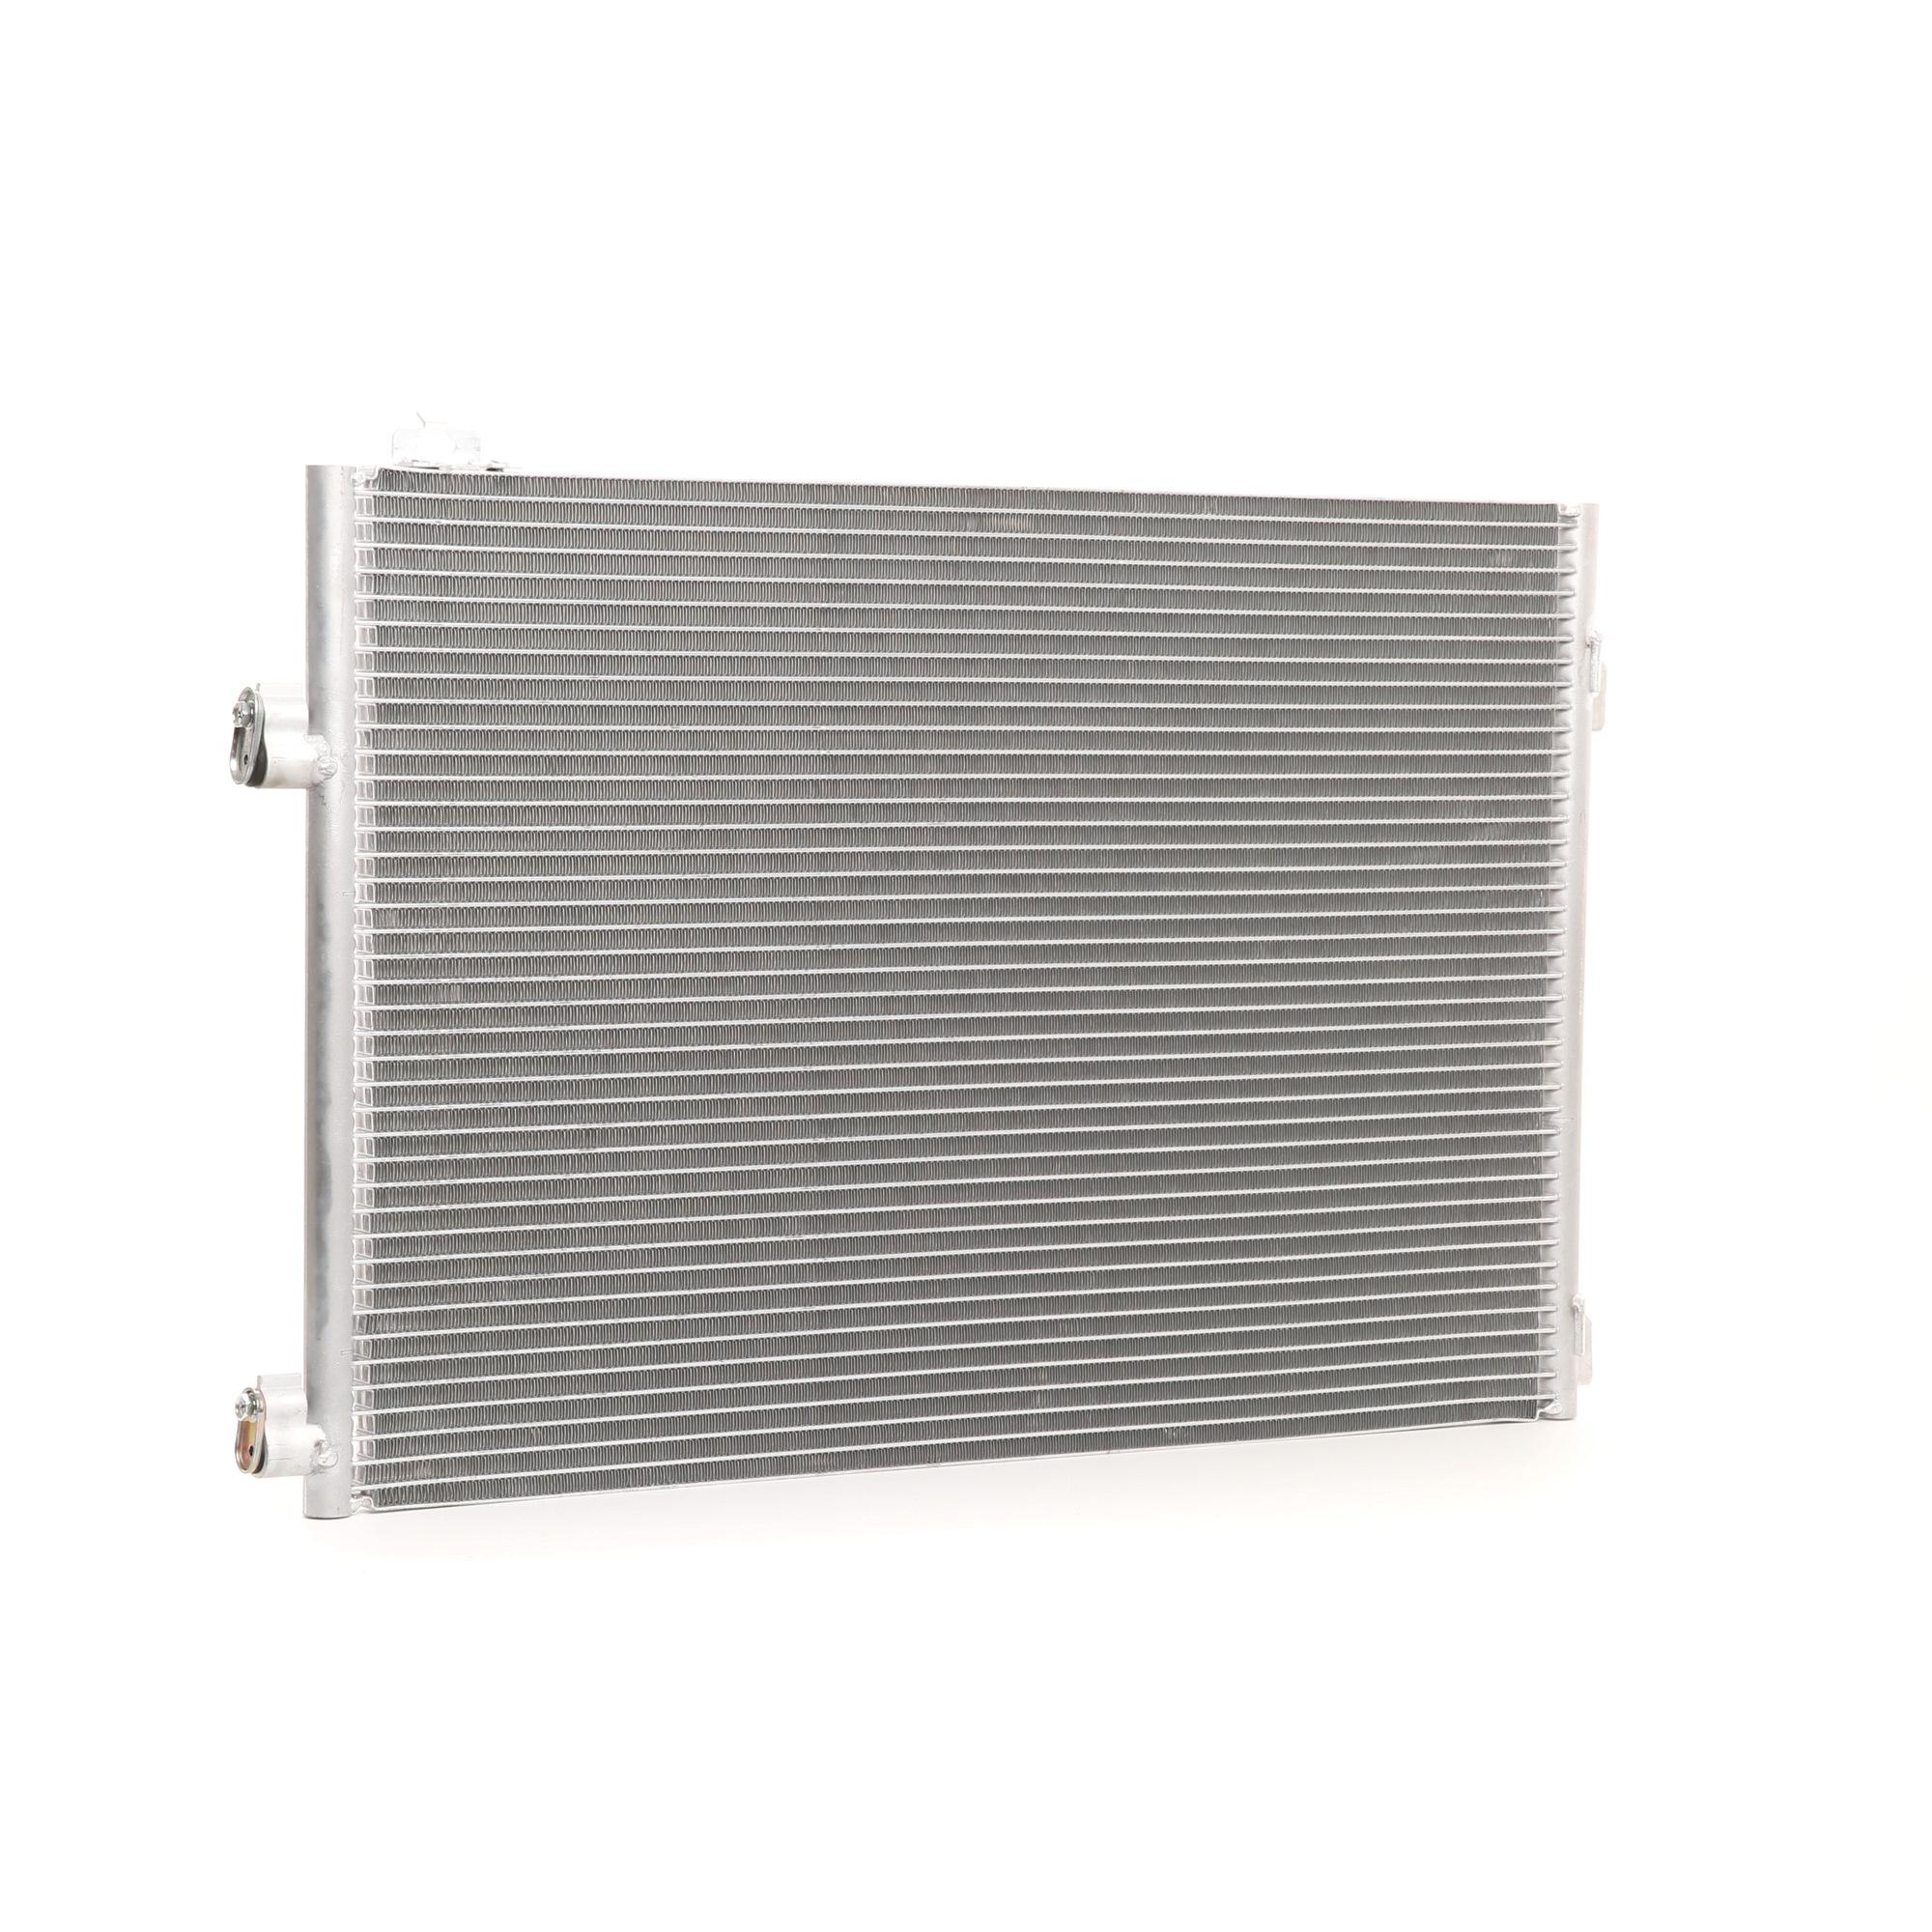 RENAULT 16 Kondensator Klimaanlage - Original RIDEX 448C0247 Netzmaße: 625 x 405 x 16 mm